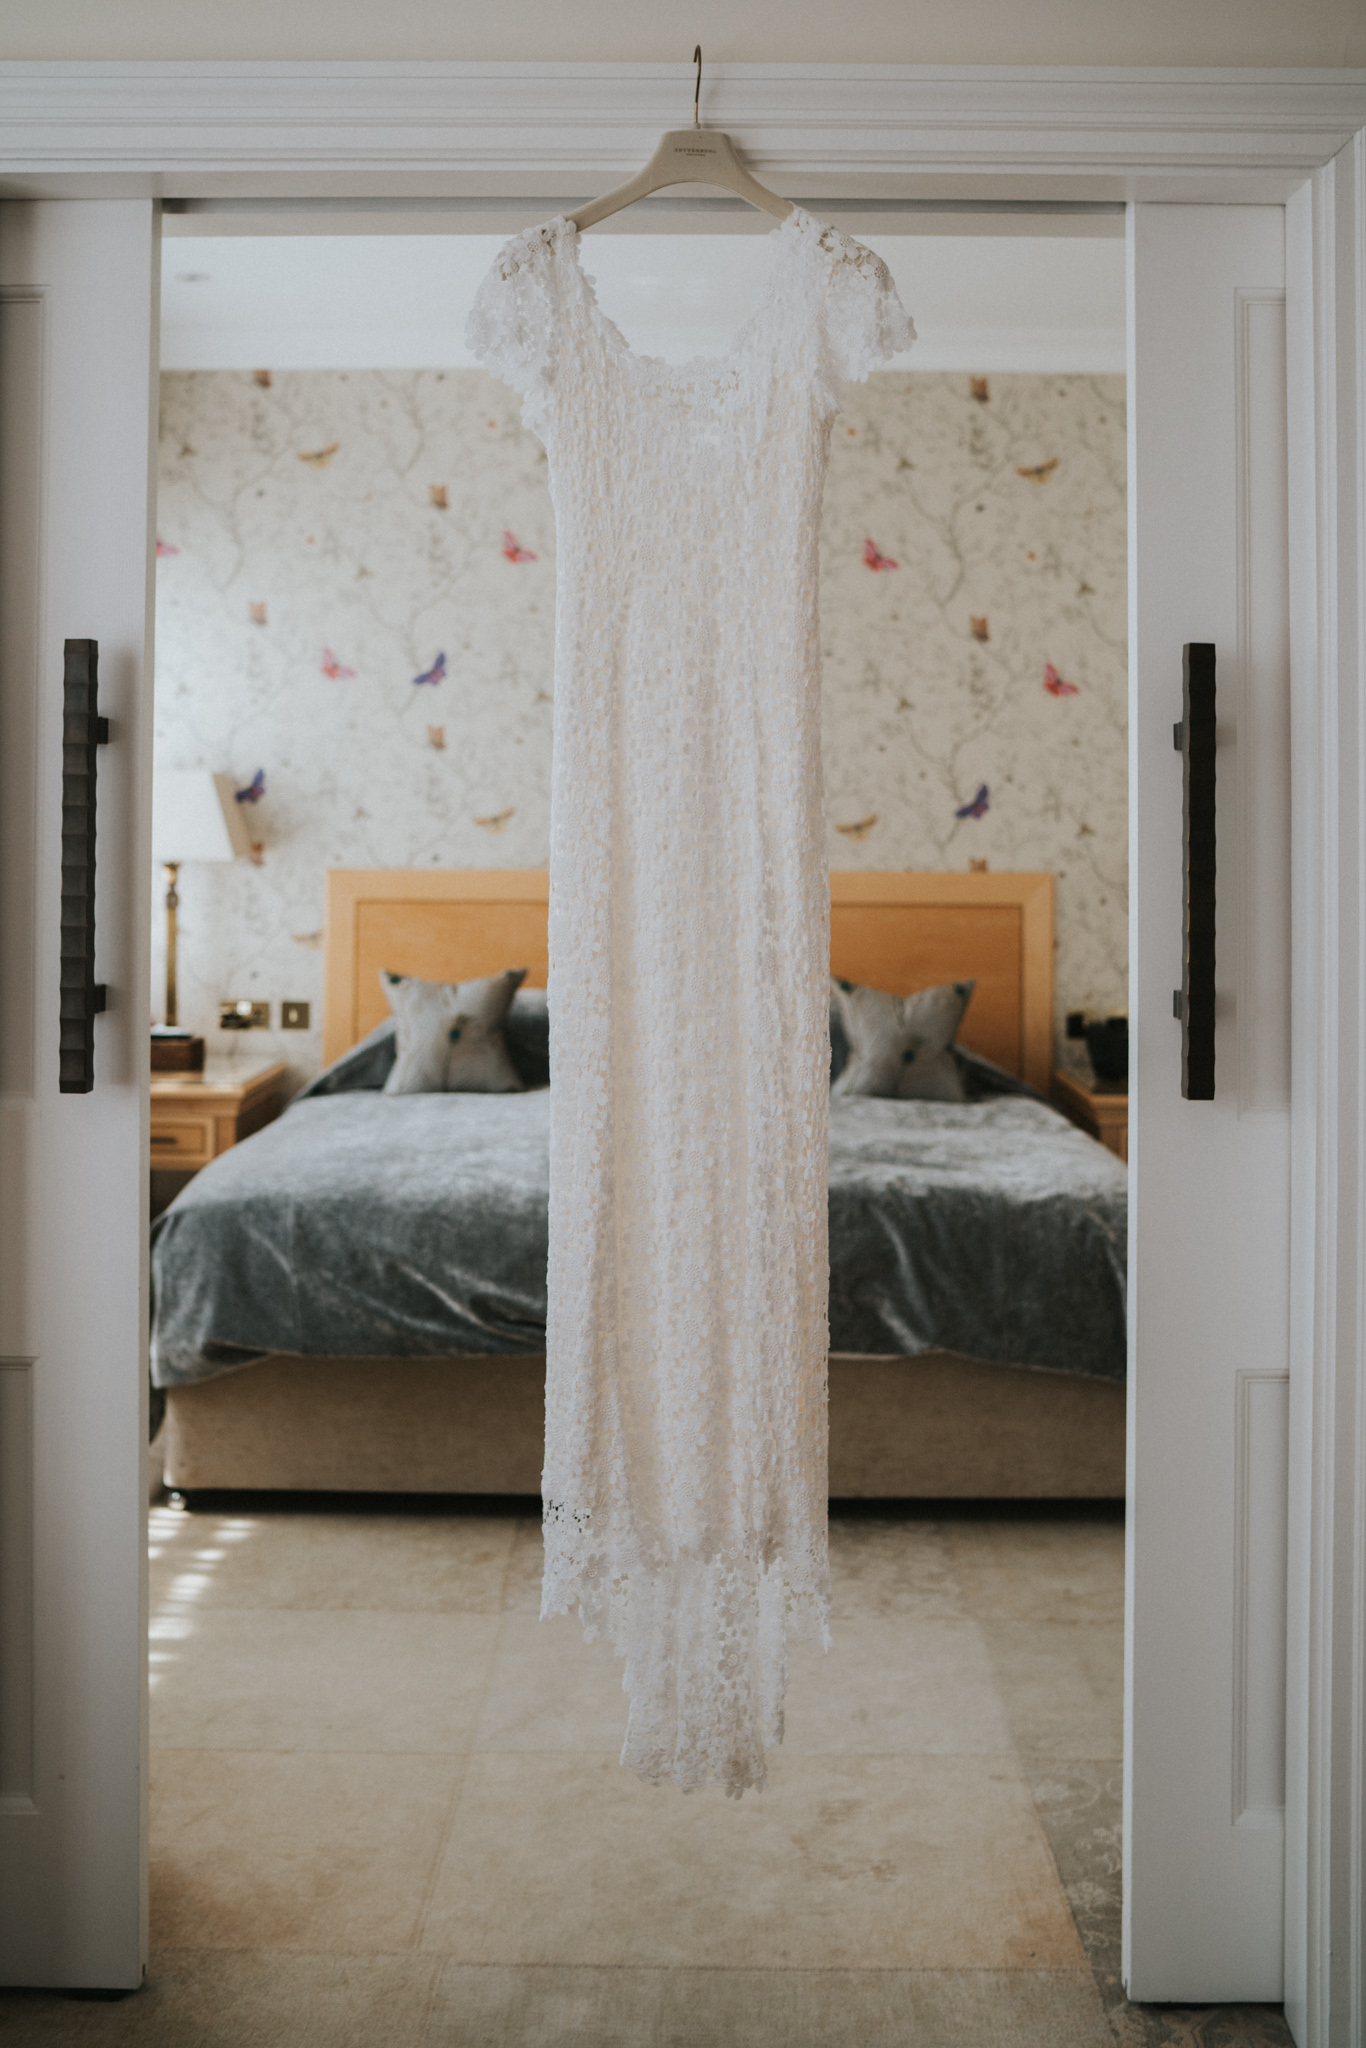 Grace-Elizabeth-Georgie-Amalaketu-Firstsite-Colchester-Essex-Boho-Buddhist-Wedding-Alternative-Wedding-Photography-Essex (1 of 100).jpg